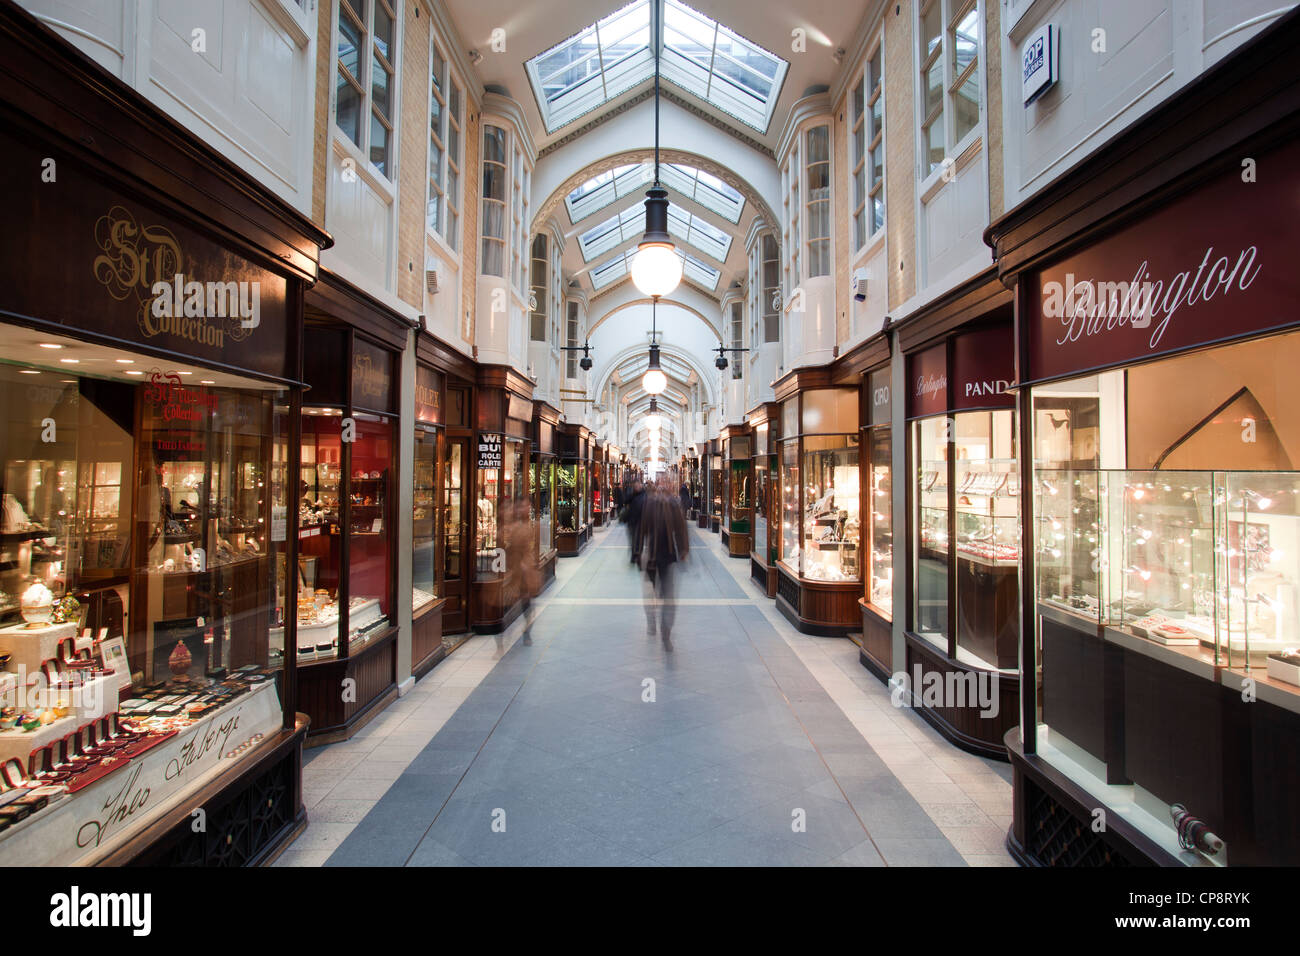 Burlington Arcade - Stock Image